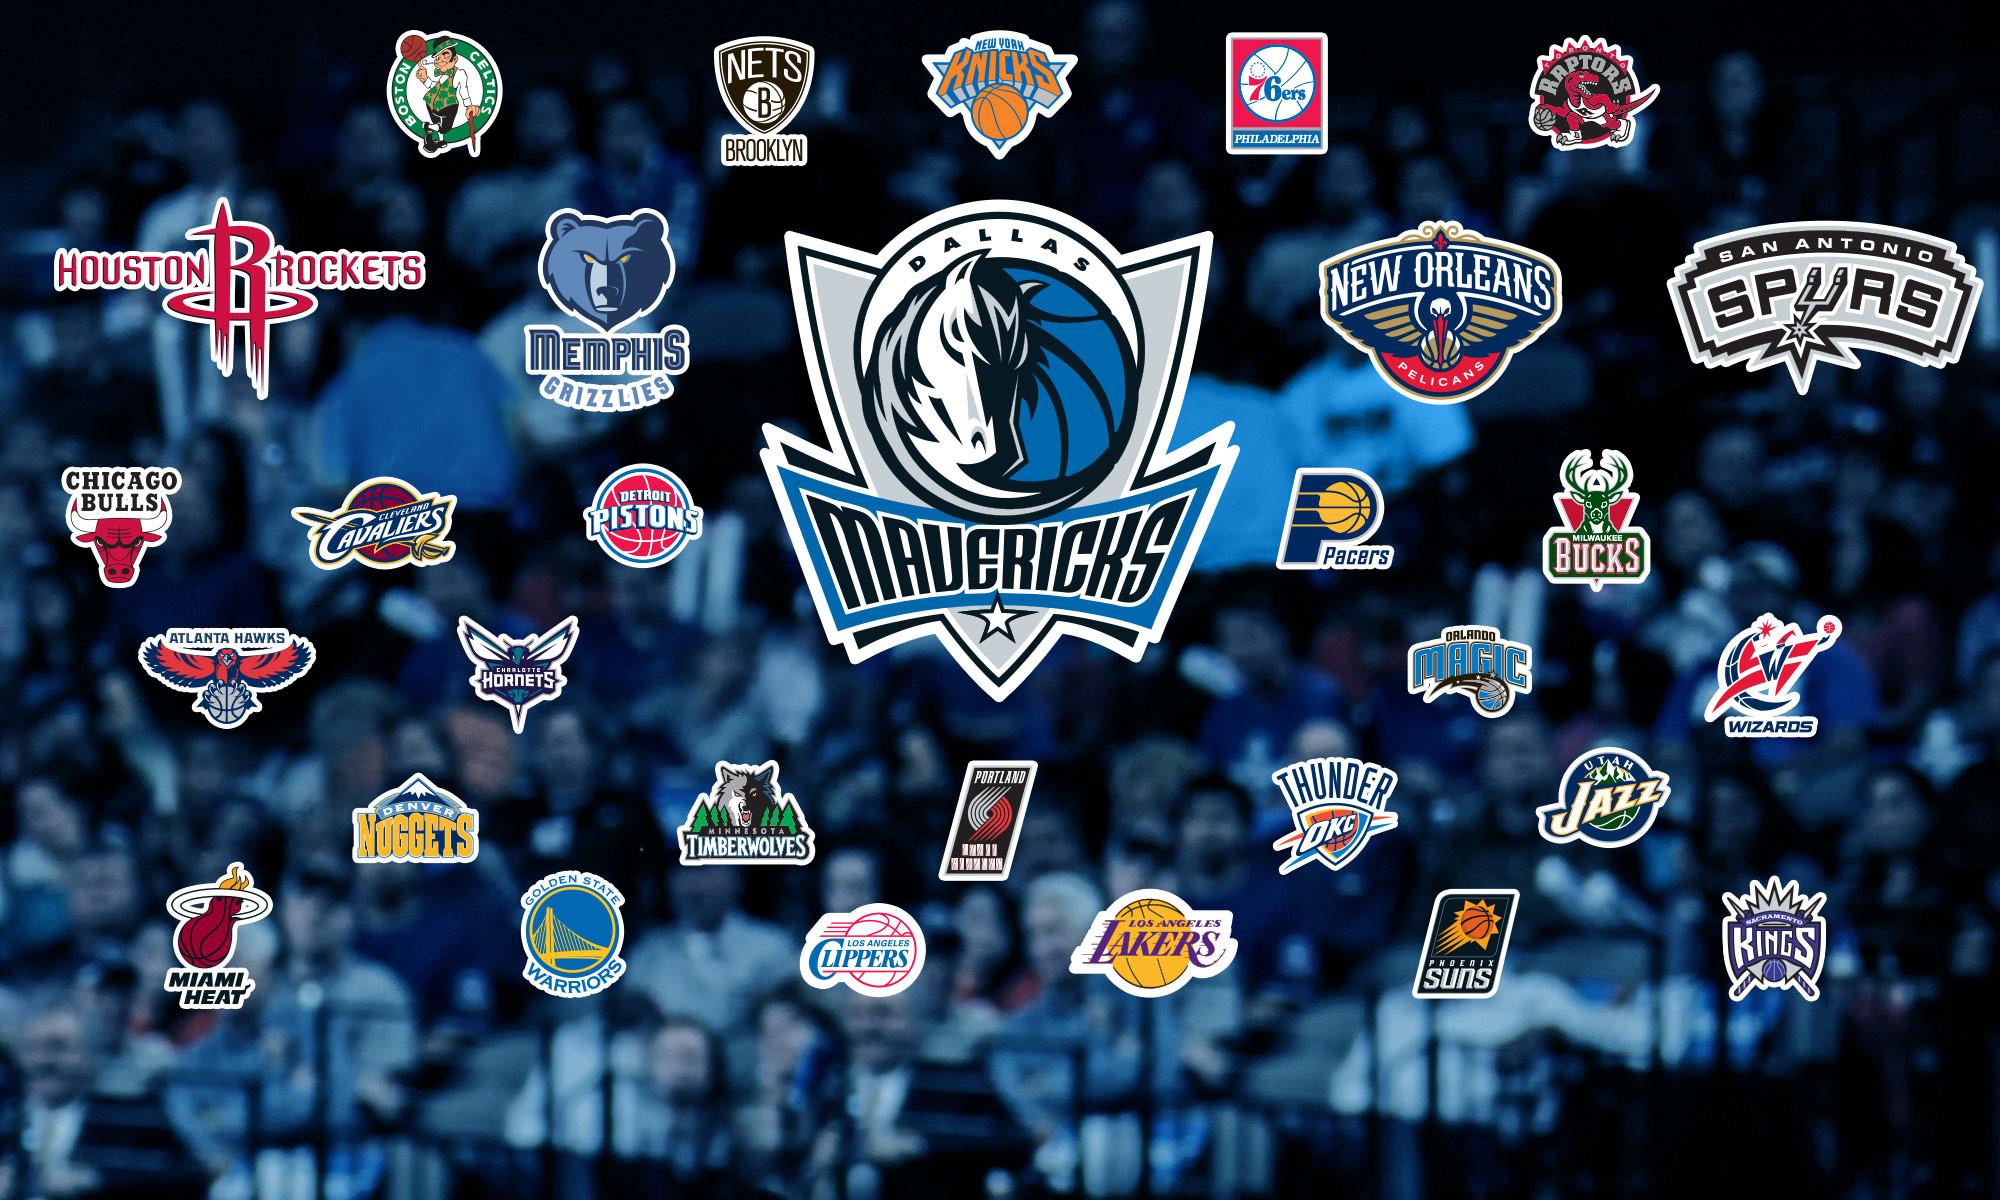 Awesome Dallas Mavericks HD Wallpaper Free Download